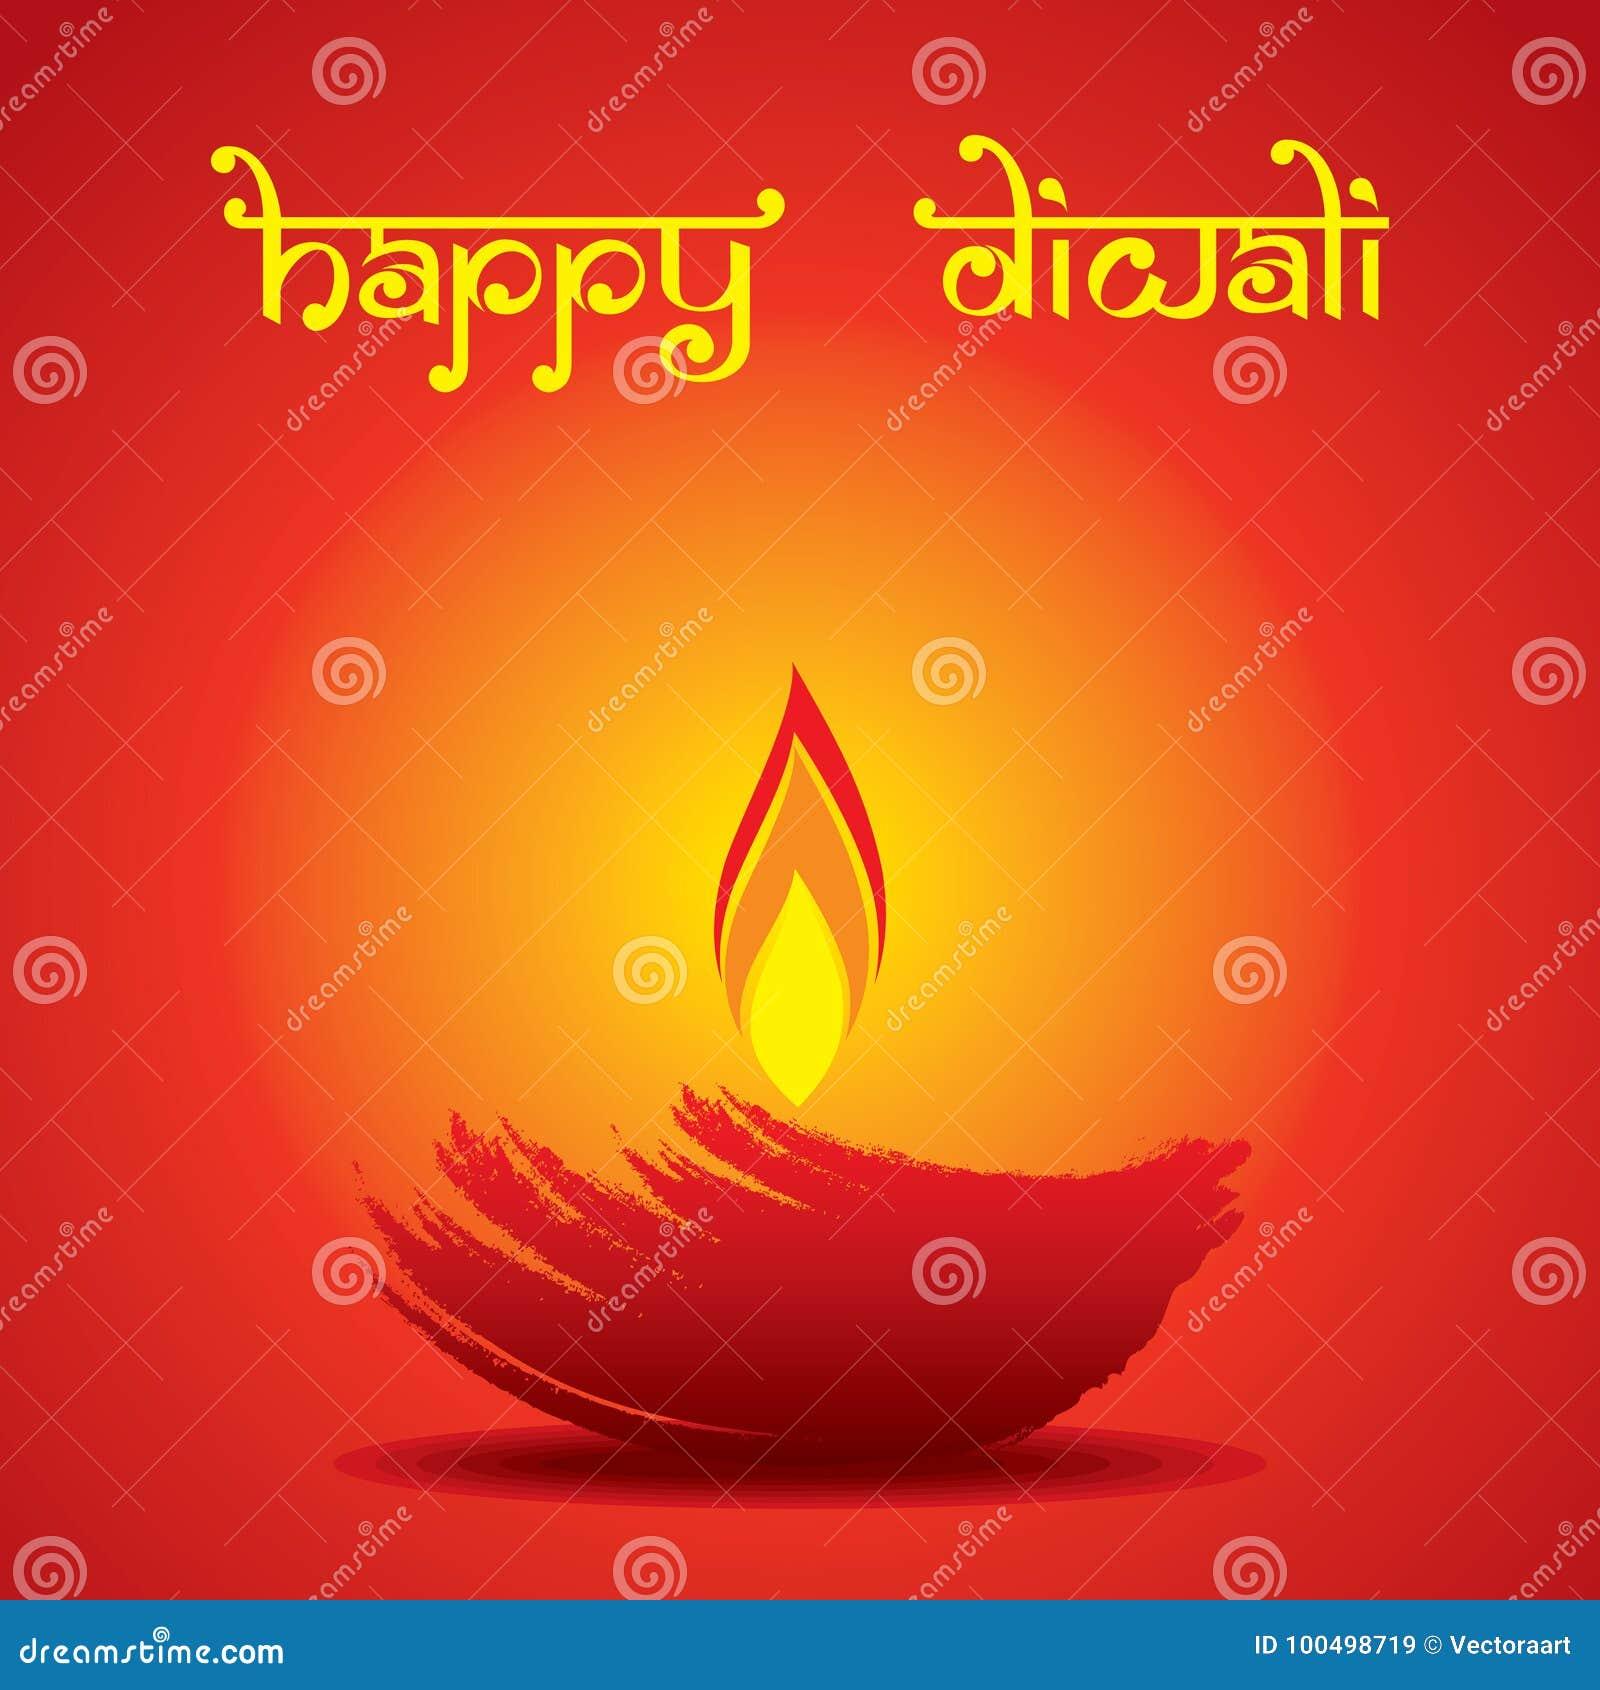 Creative happy diwali festival greeting design stock vector download creative happy diwali festival greeting design stock vector illustration of elegant card m4hsunfo